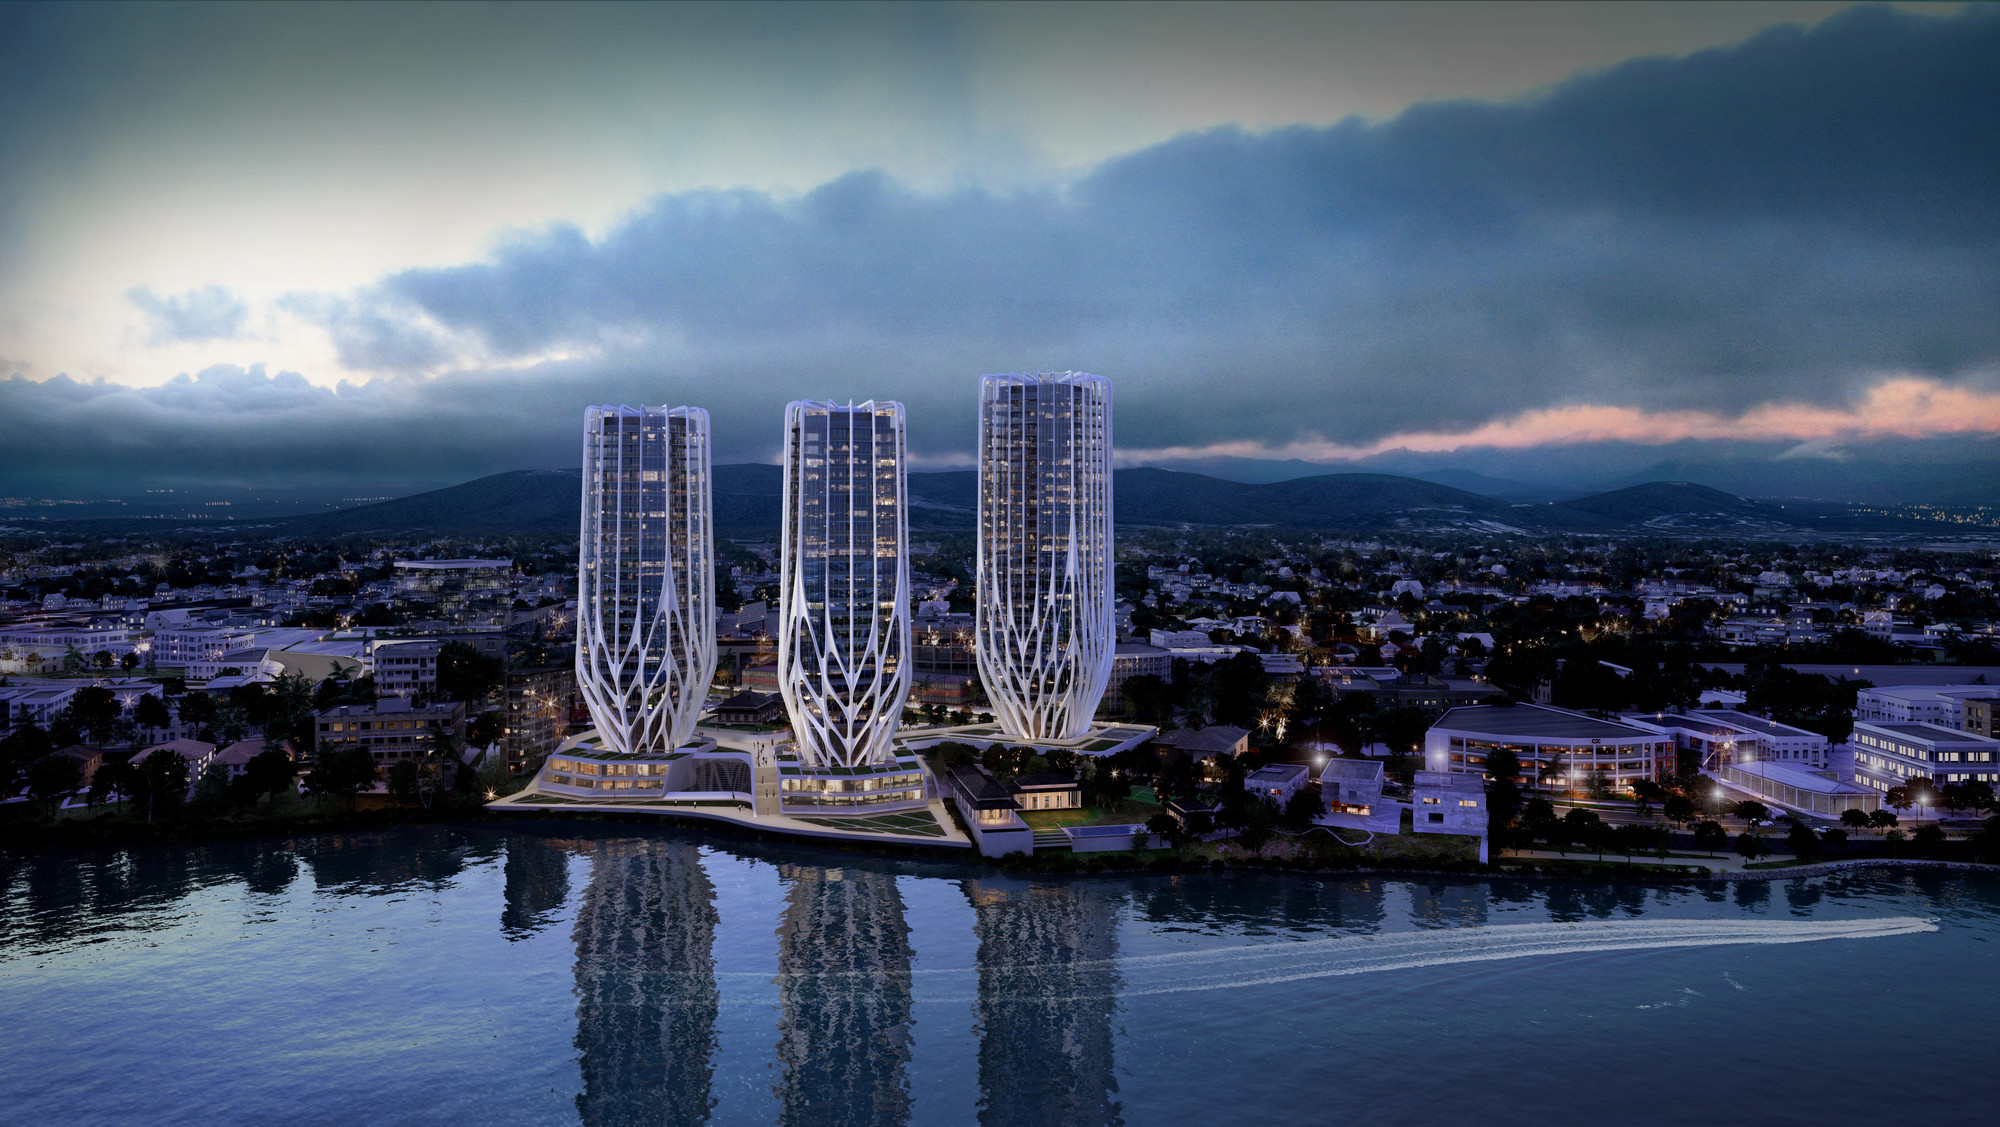 Zaha Hadid presenta torres 'floridas' en borde costero de Brisbane, © Zaha Hadid Architects